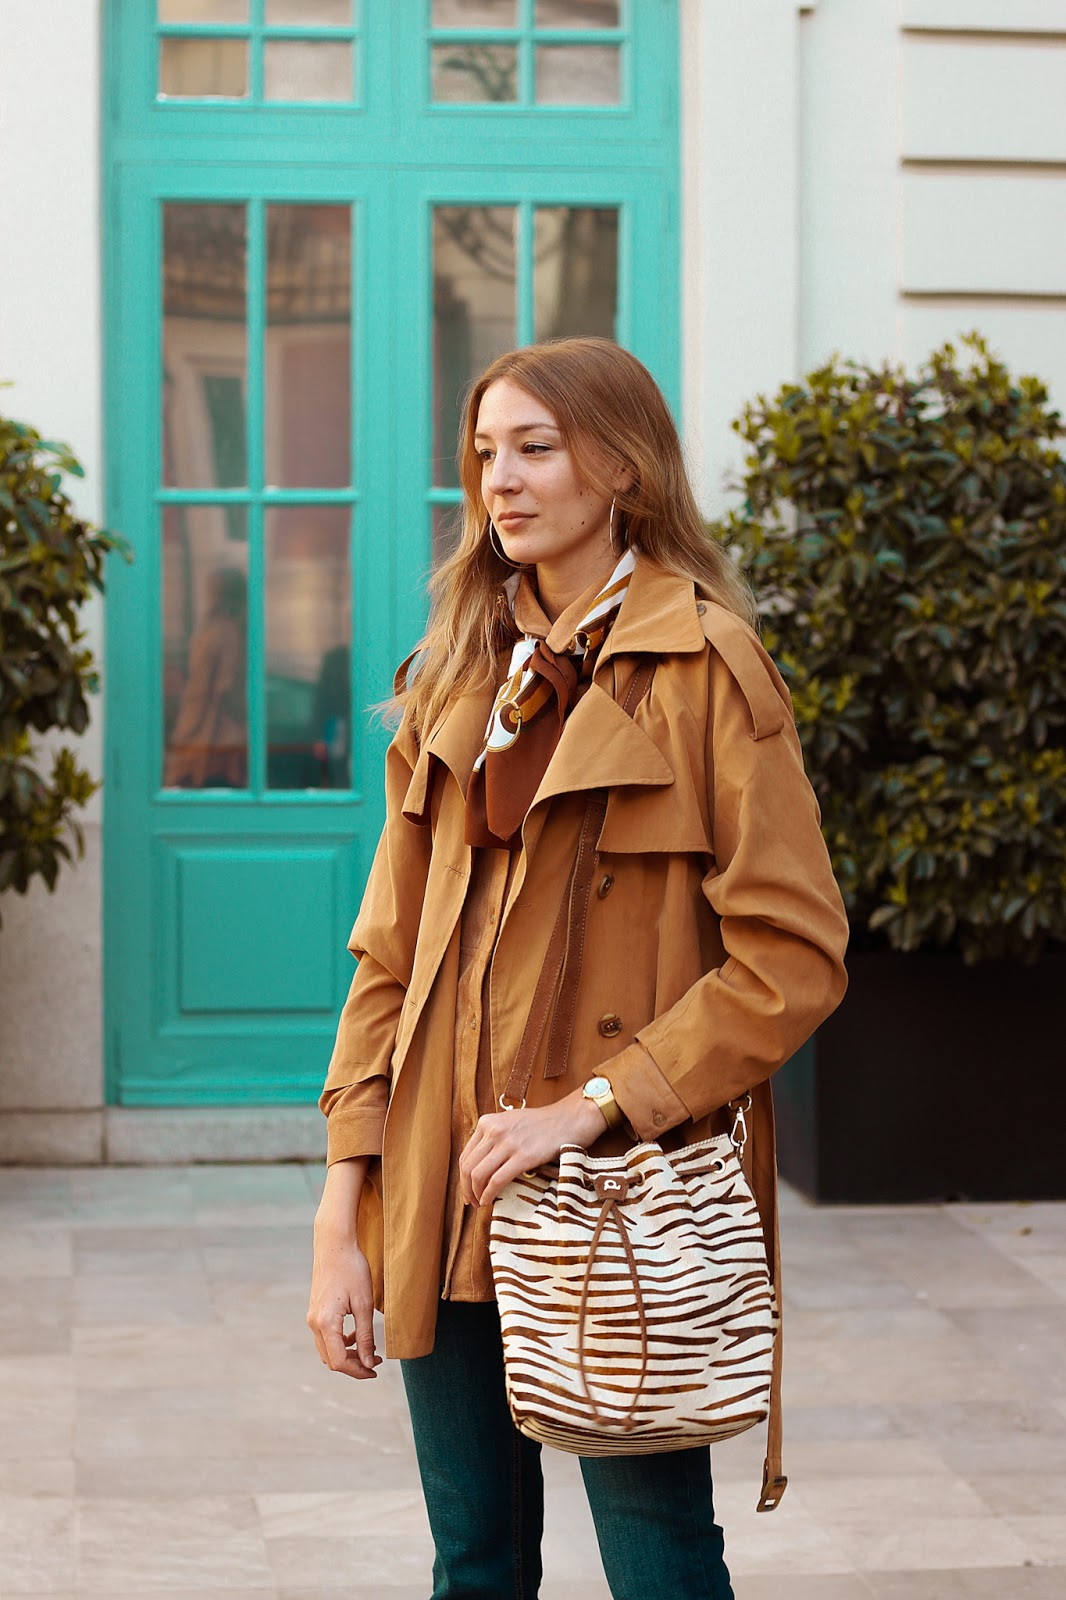 pantalones-campana-amichi-bolso-animal-print-zebra-dayaday-street-style